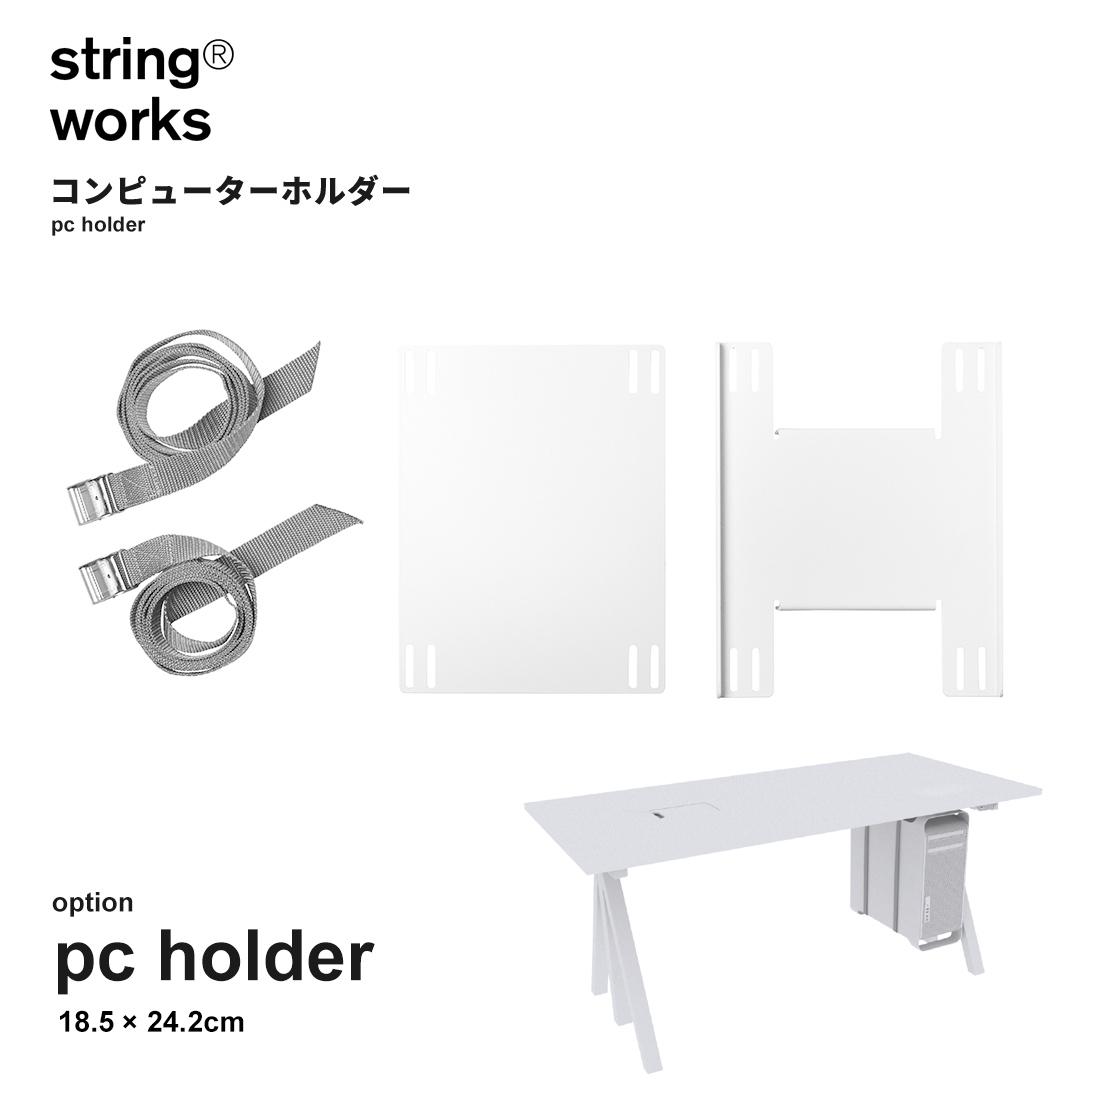 【string ストリング】string works オプション コンピューターホルダー 机 テーブル 作業台 折りたたみ式 折り畳みテーブル ダイニングテーブル